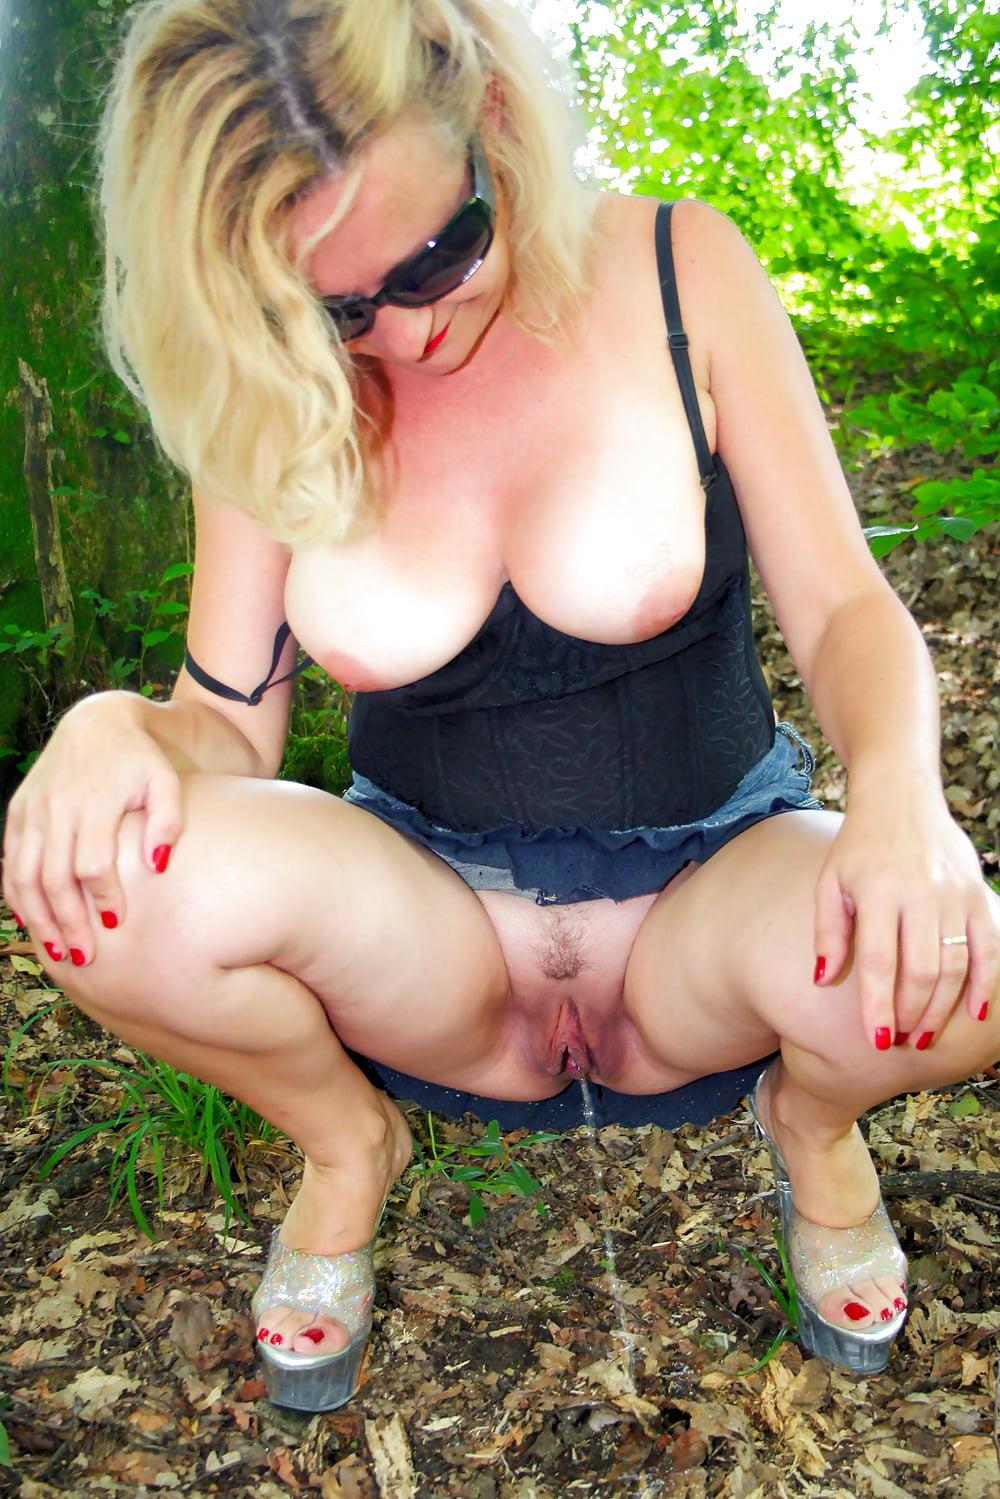 Female domination amature pissing wife cheryl ladd amatures